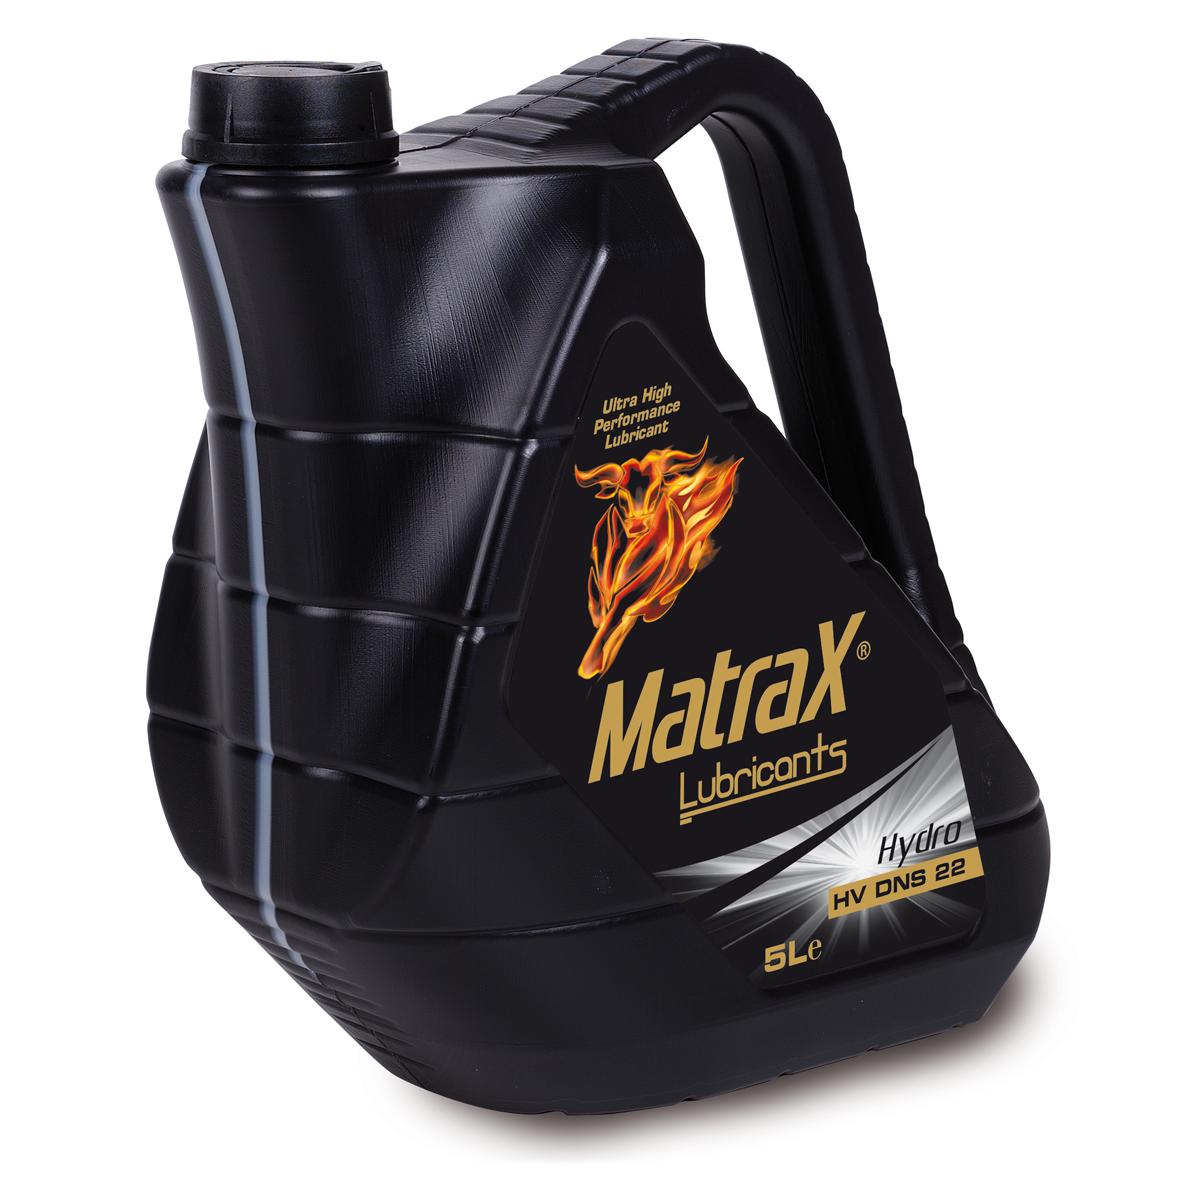 matrax-lubricants-hydro-hv-dns-22-5l